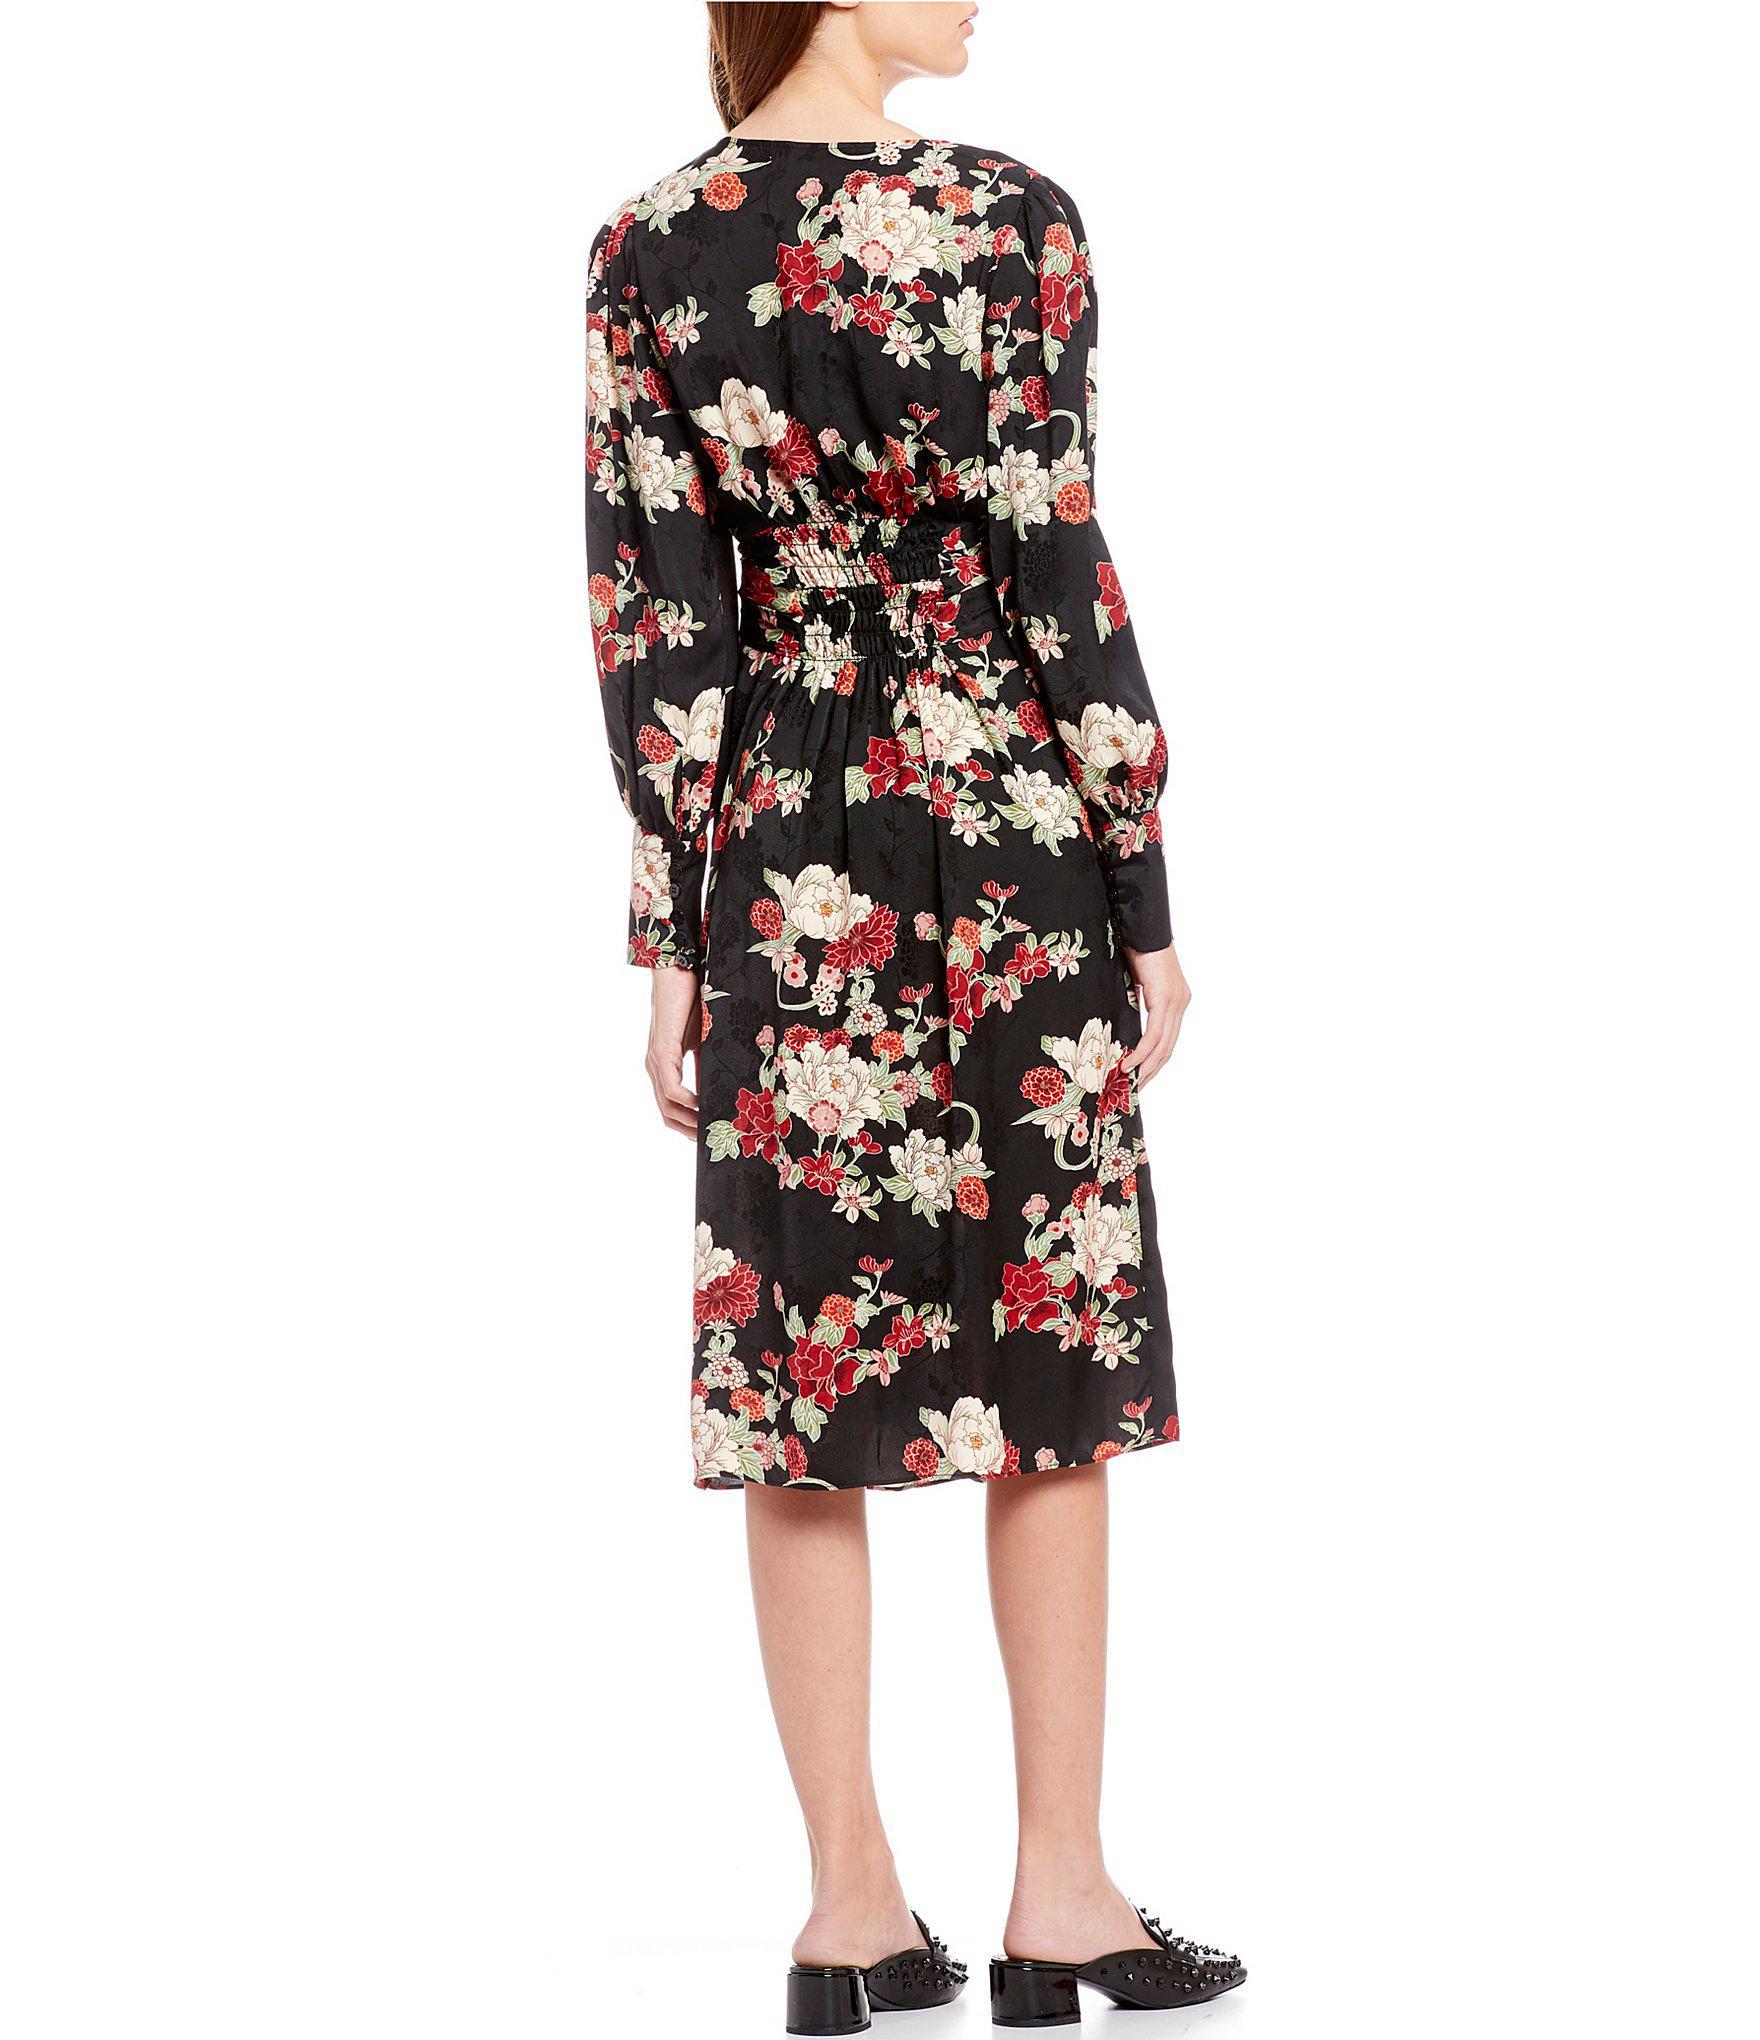 96e92bceaa Chelsea   Violet - Black Floral Printed Jacquard Wrap Style Midi Dress -  Lyst. View fullscreen